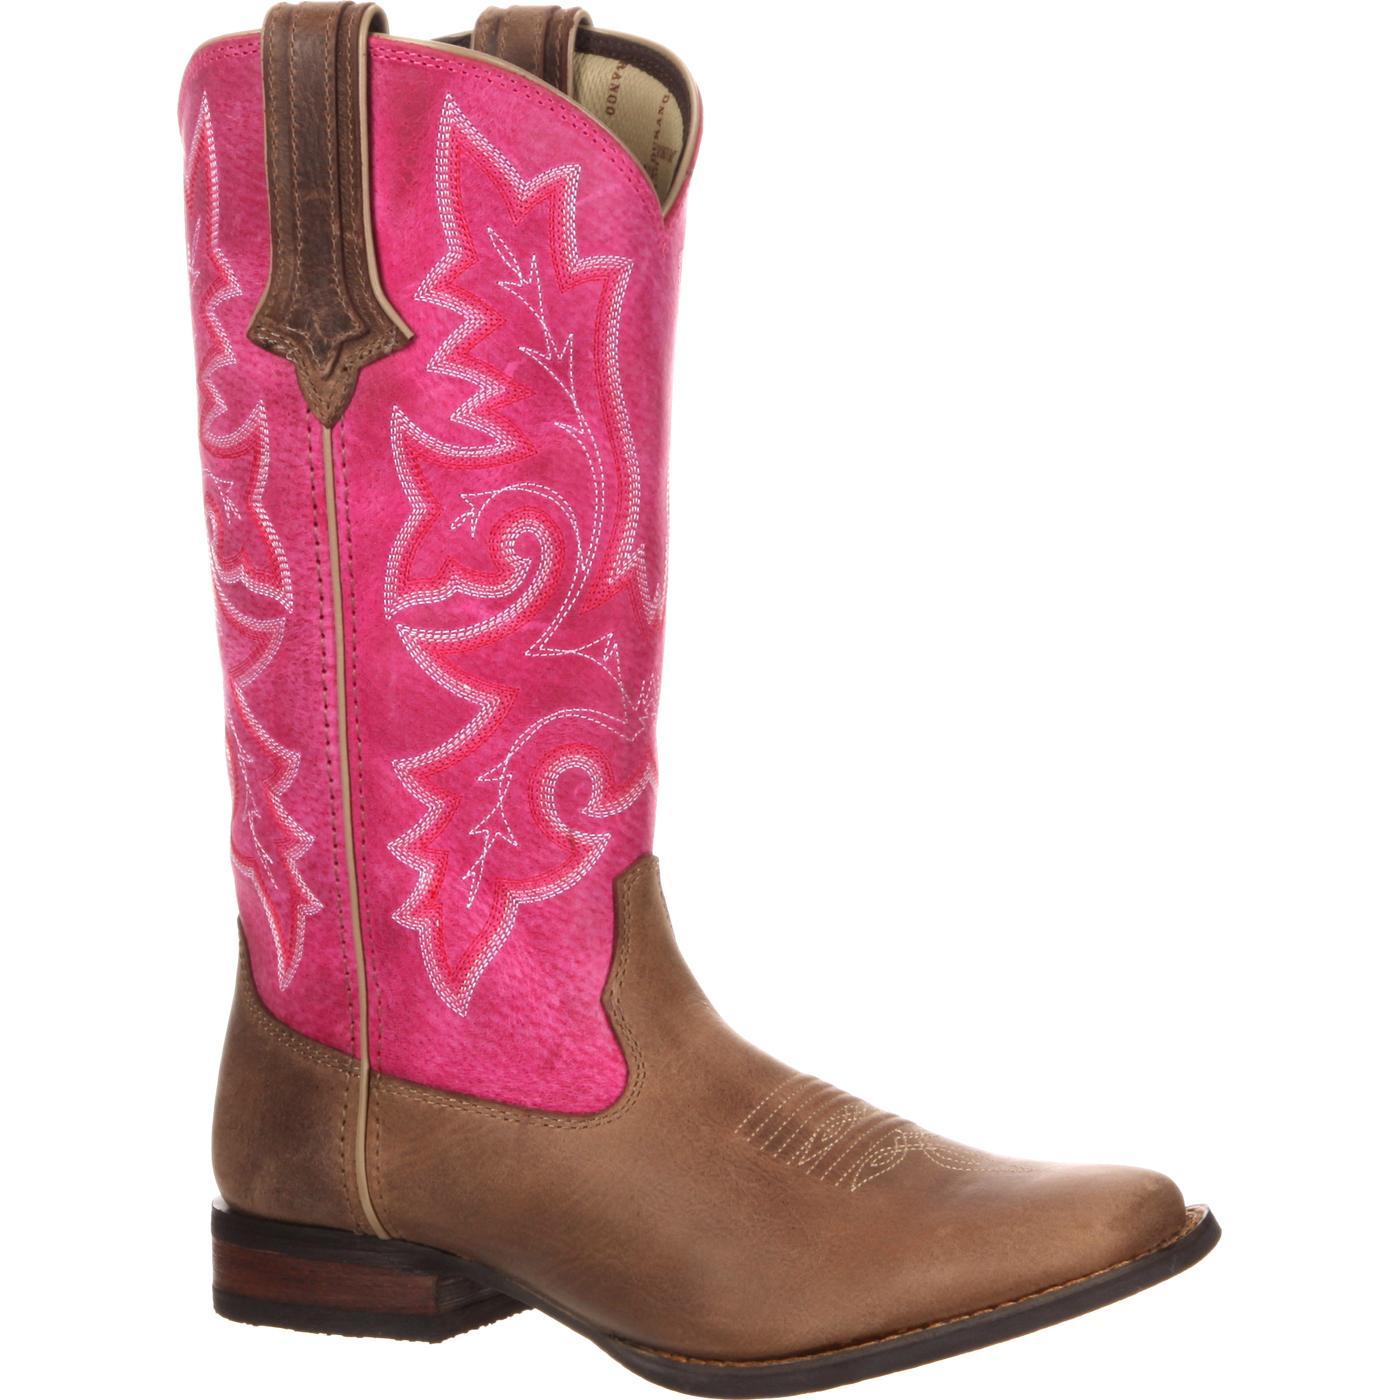 d3789f22cd68e Crush by Durango Women's Western Boot